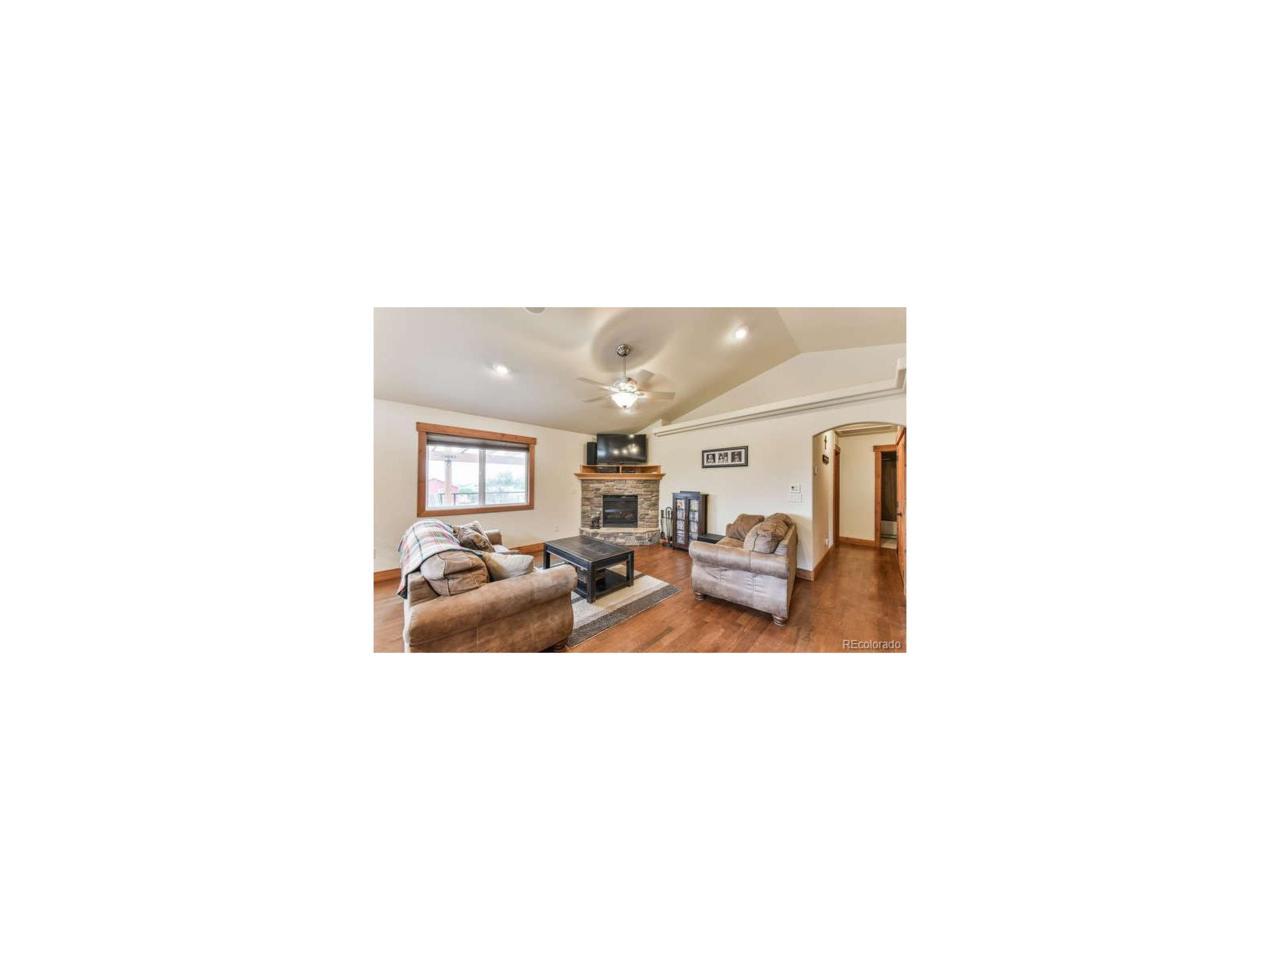 4230 Cotopaxi Drive, Loveland, CO 80538 (MLS #7286962) :: 8z Real Estate